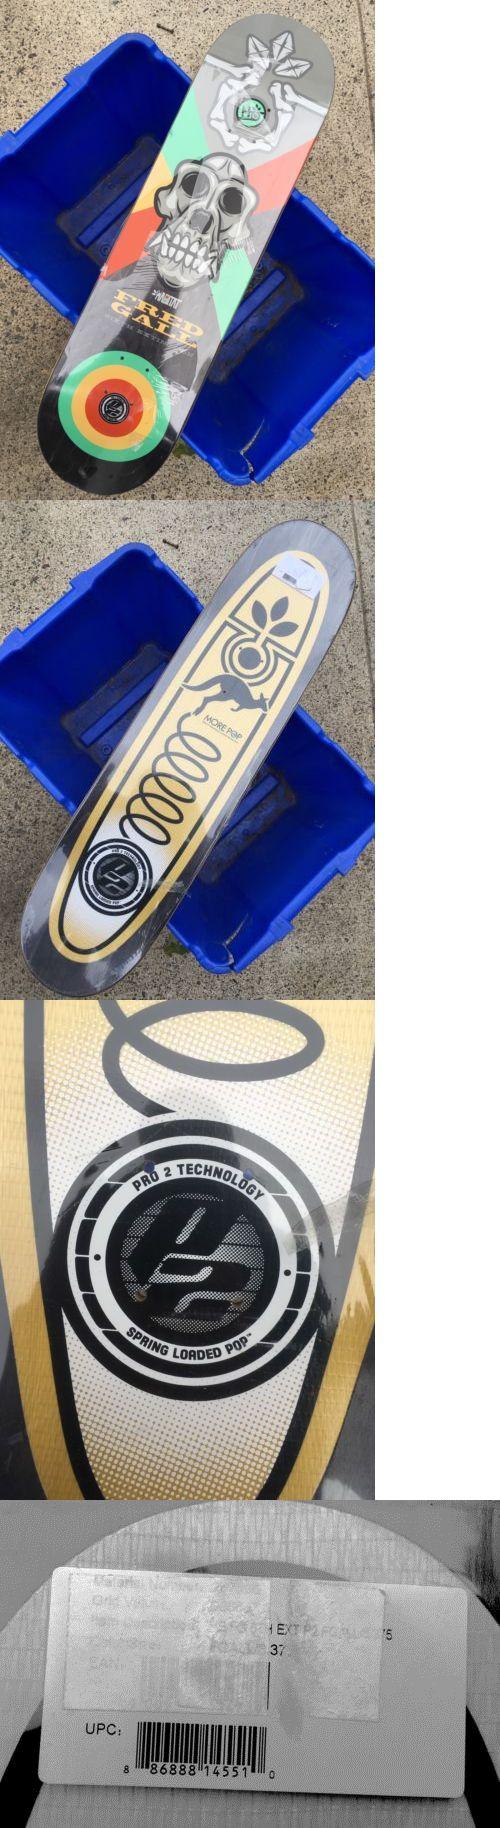 Decks 16263: Habitat Gall Skateboard Deck 8.25 X 32 Still Wrapped -> BUY IT NOW ONLY: $35 on eBay!